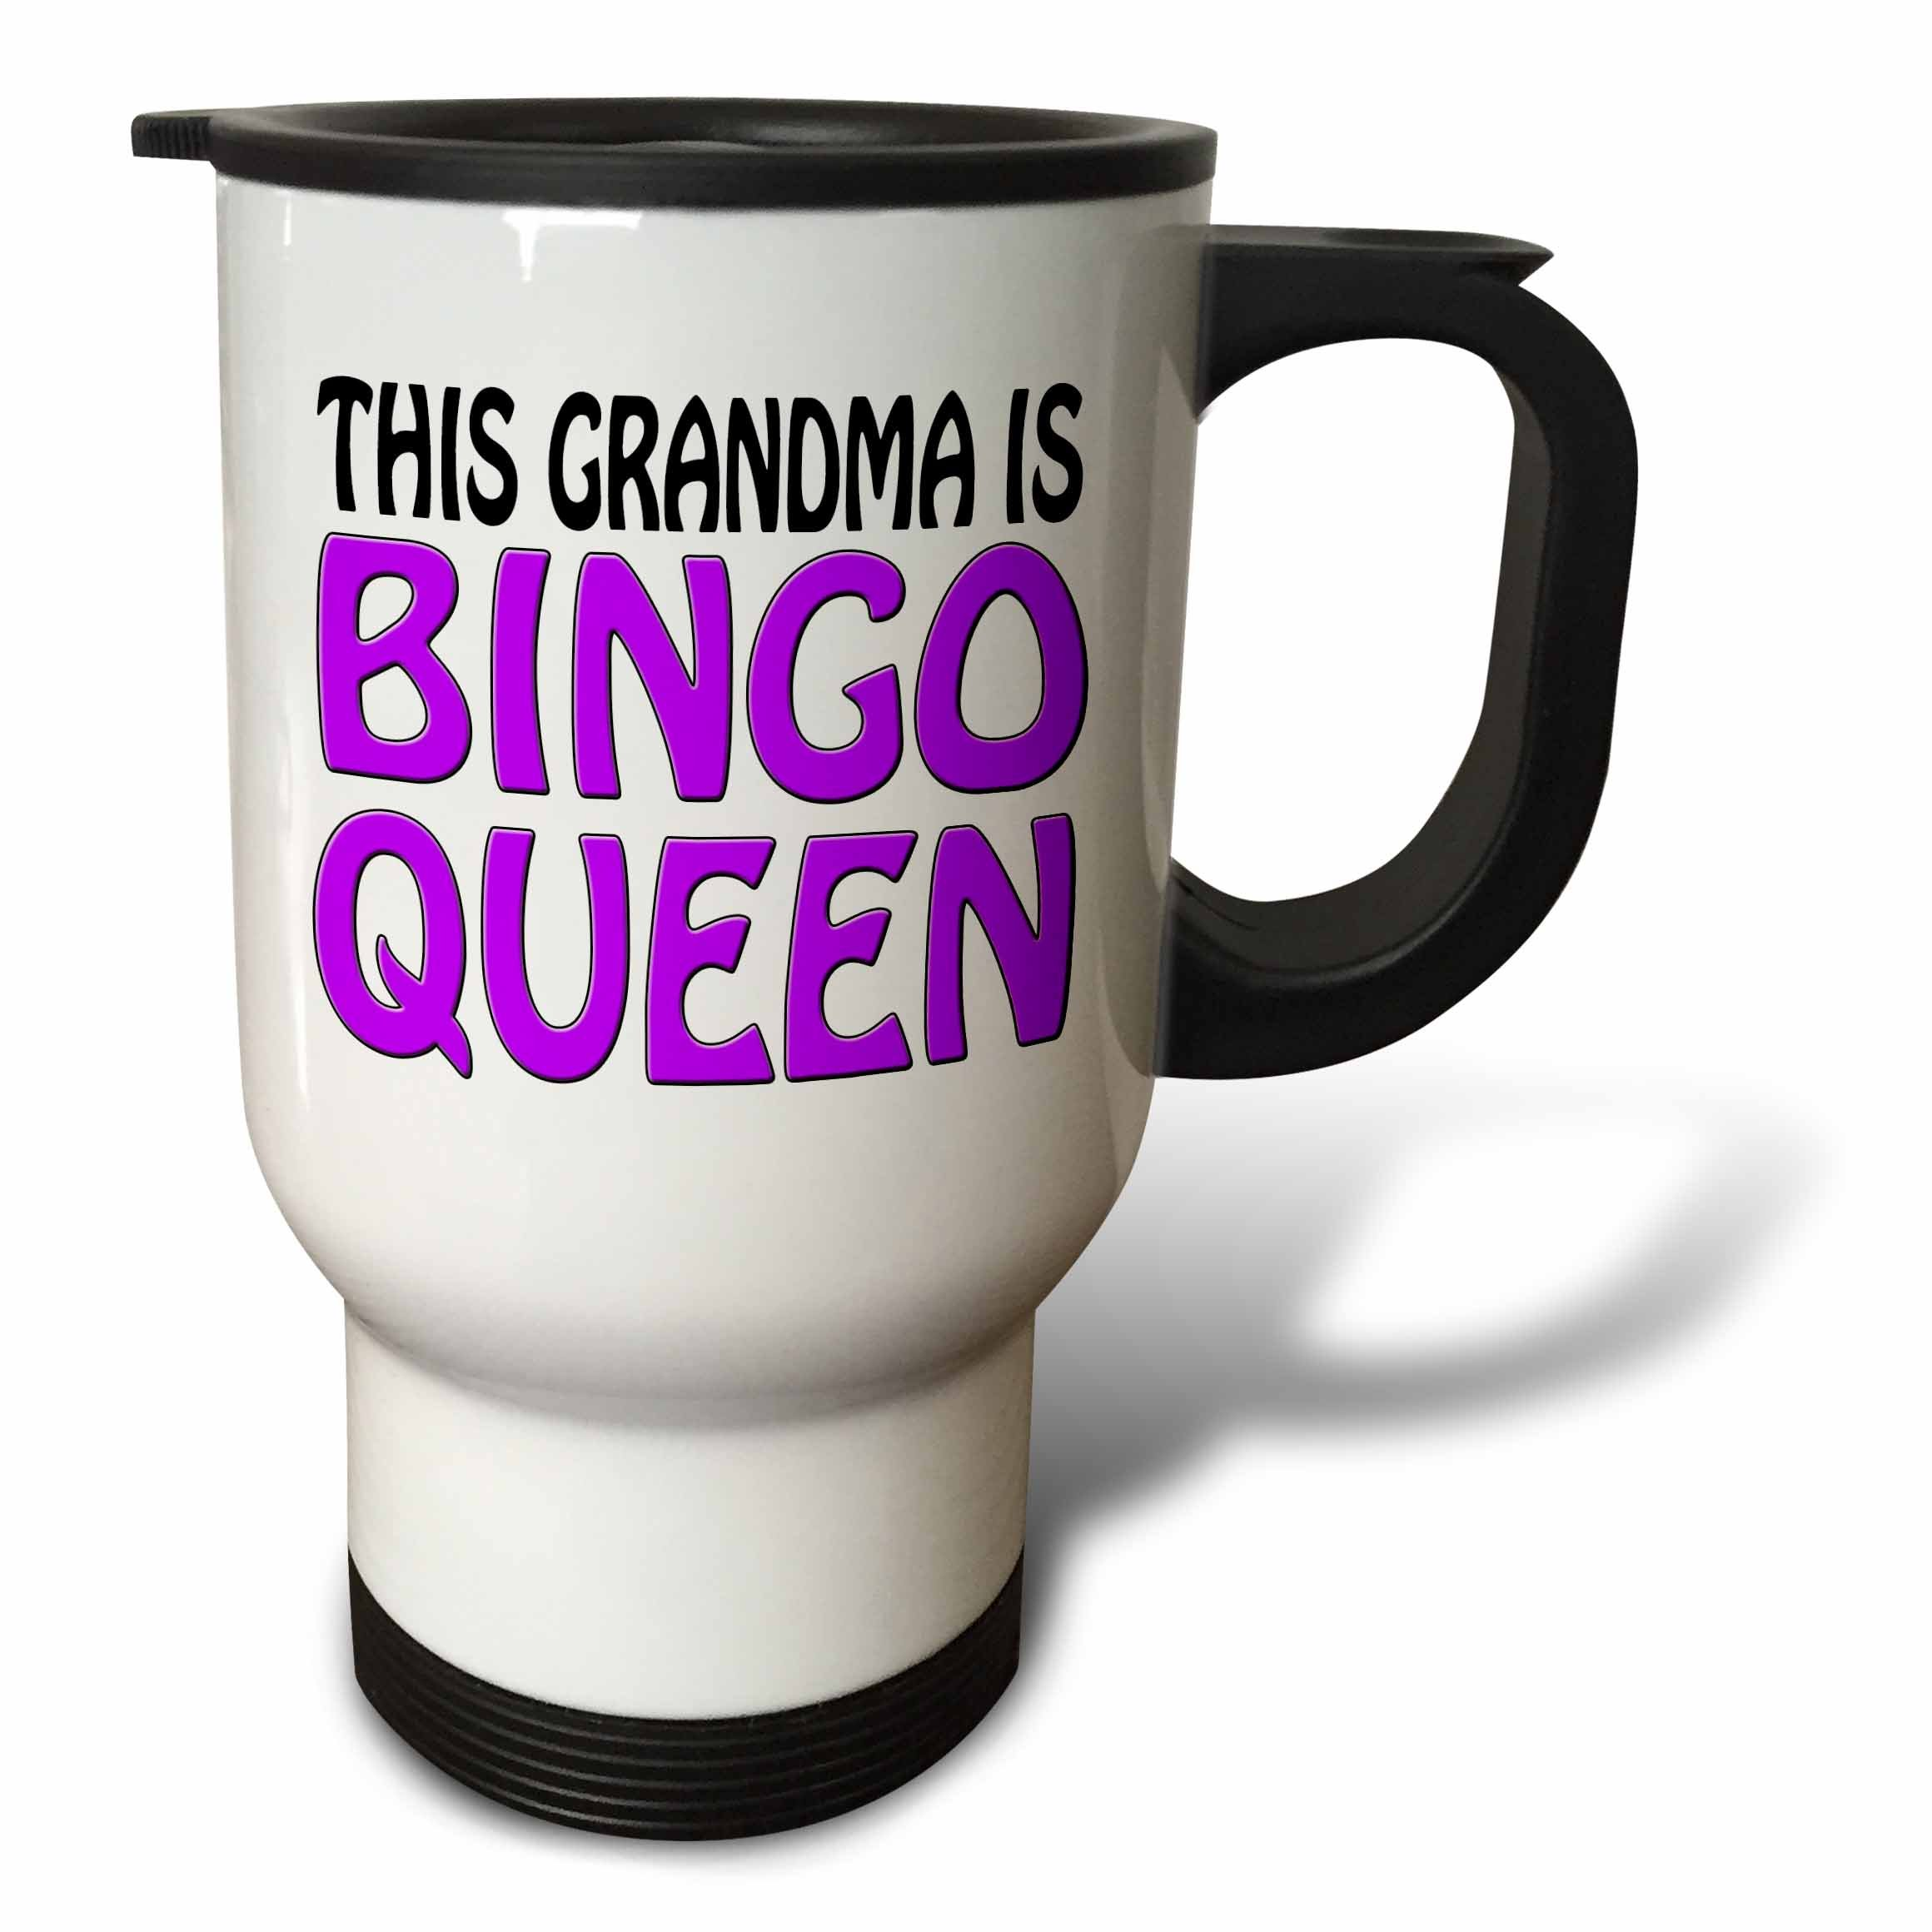 3dRose This Grandma is Bingo Queen Purple Travel Mug, 14-Ounce by 3dRose